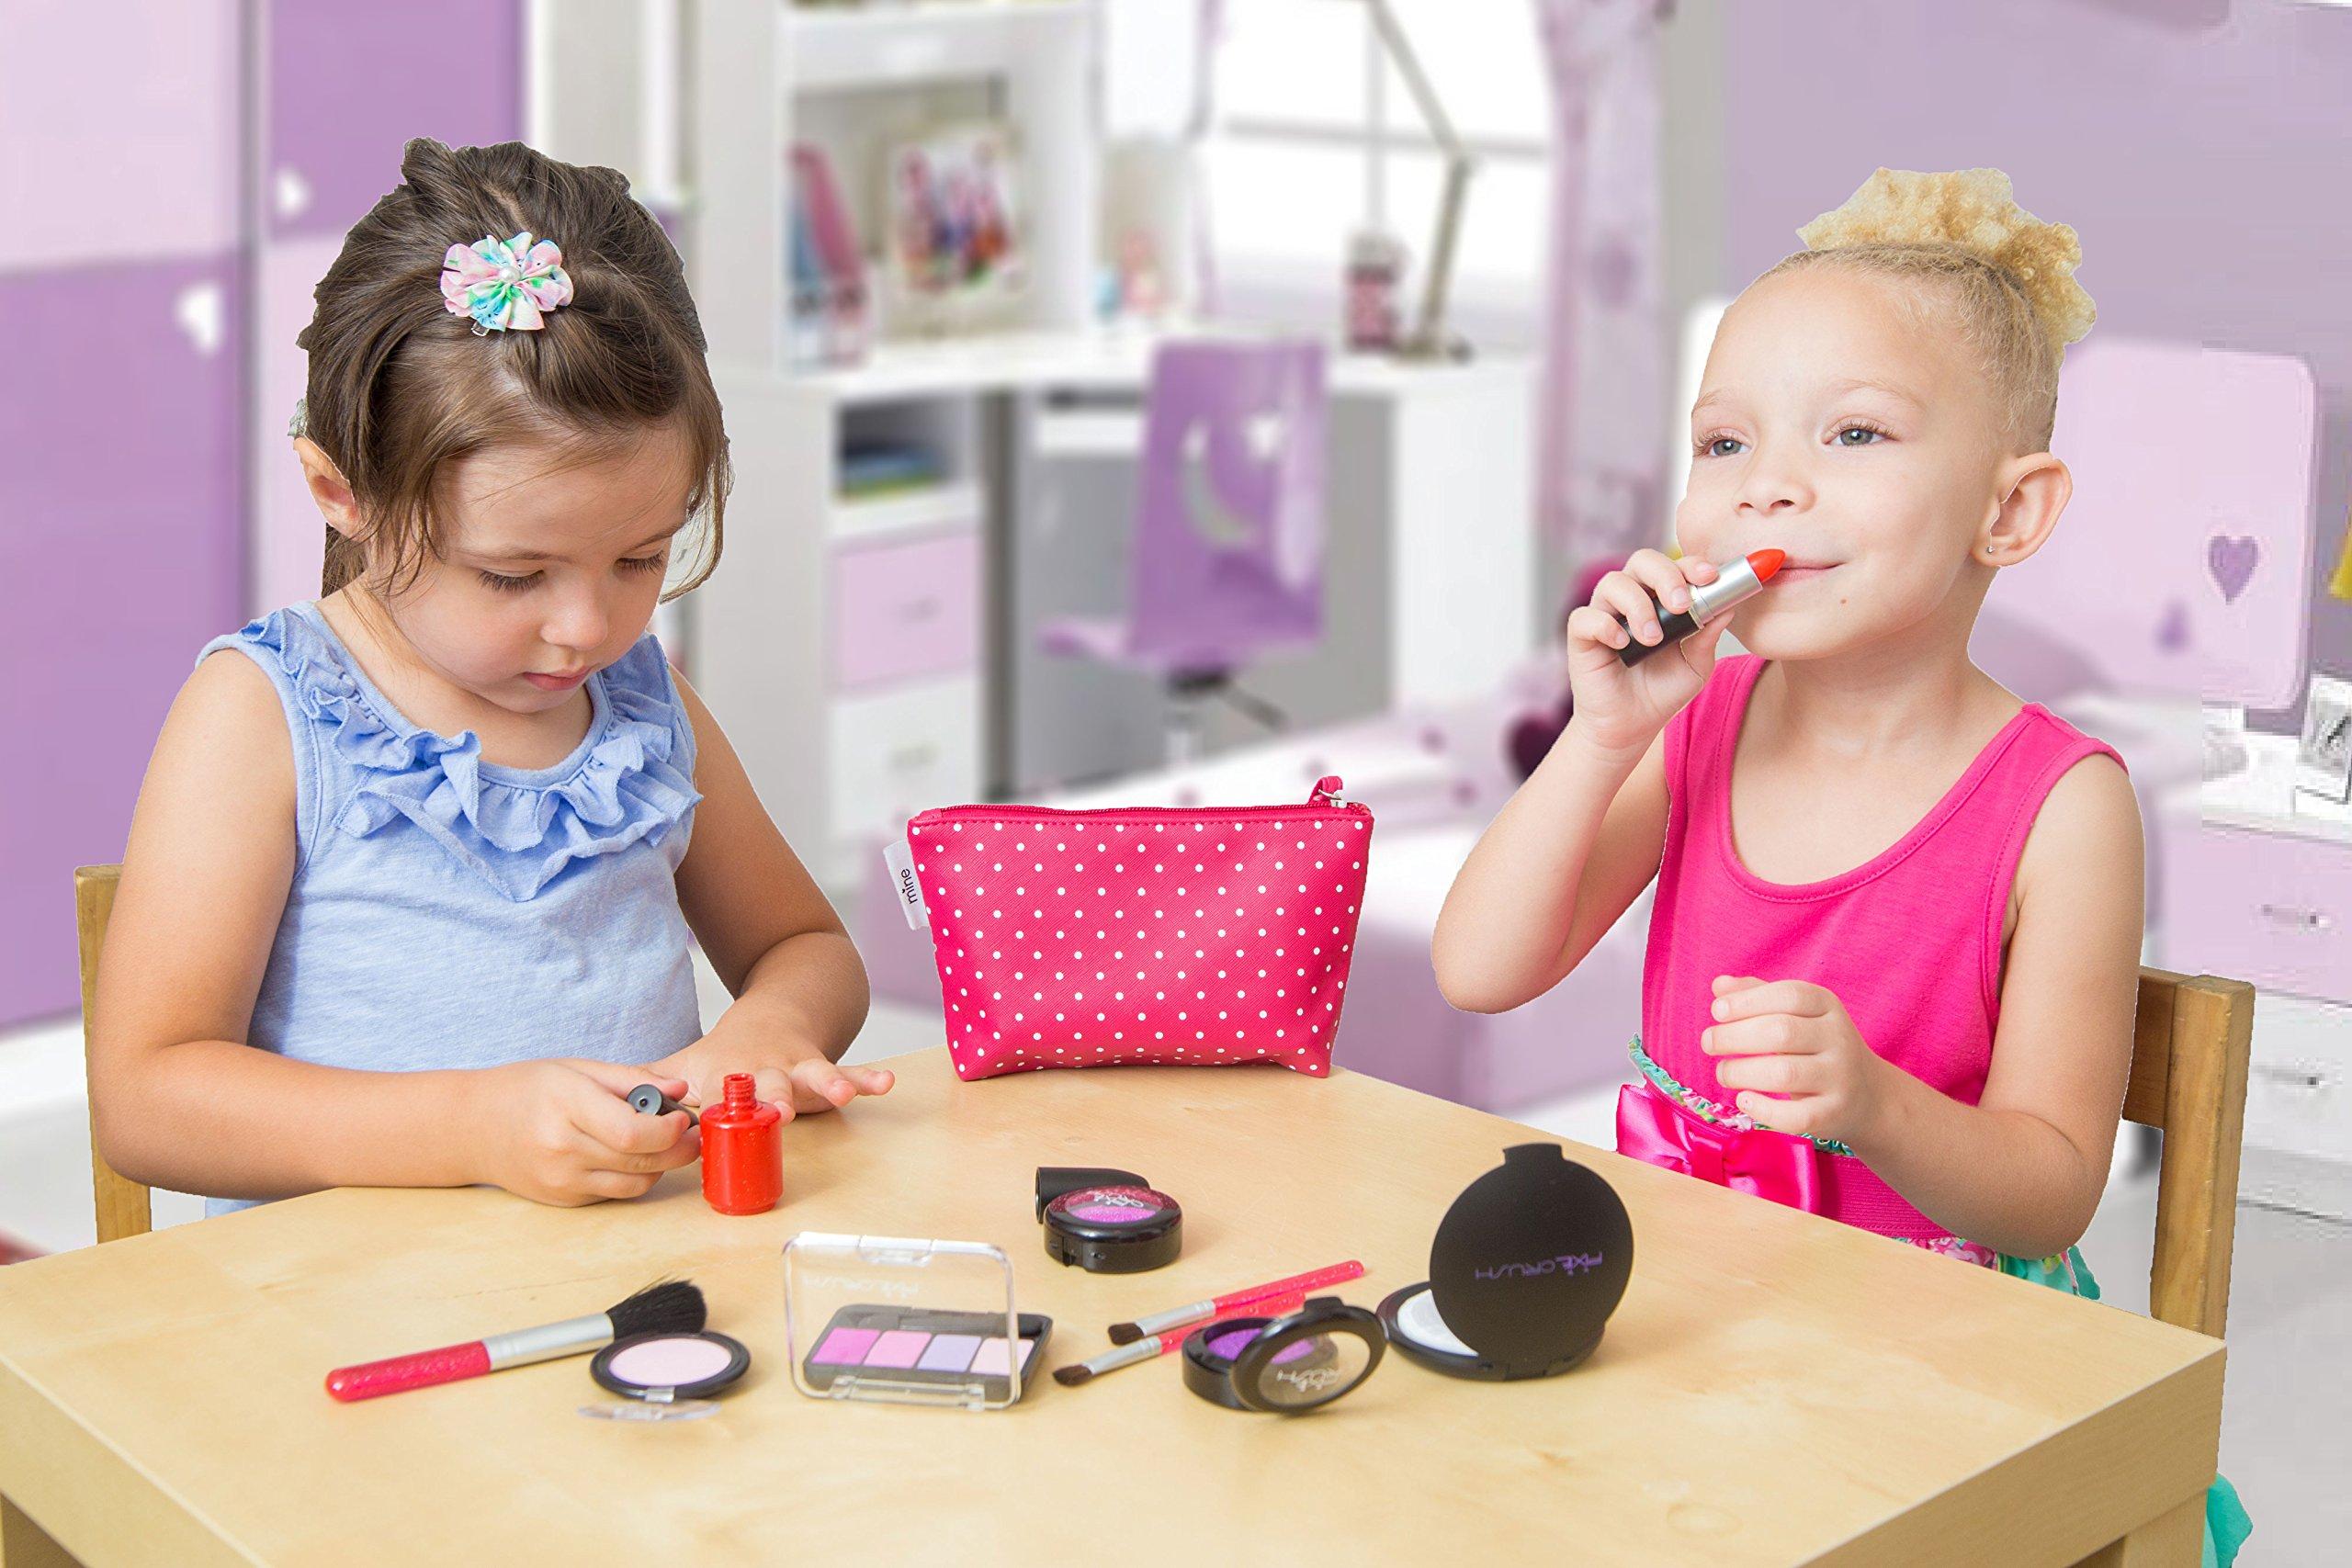 PixieCrush Pretend Play Cosmetic and Makeup Set. 13 Piece Designer Kit with Pink Polka Dot Handbag by PixieCrush (Image #3)